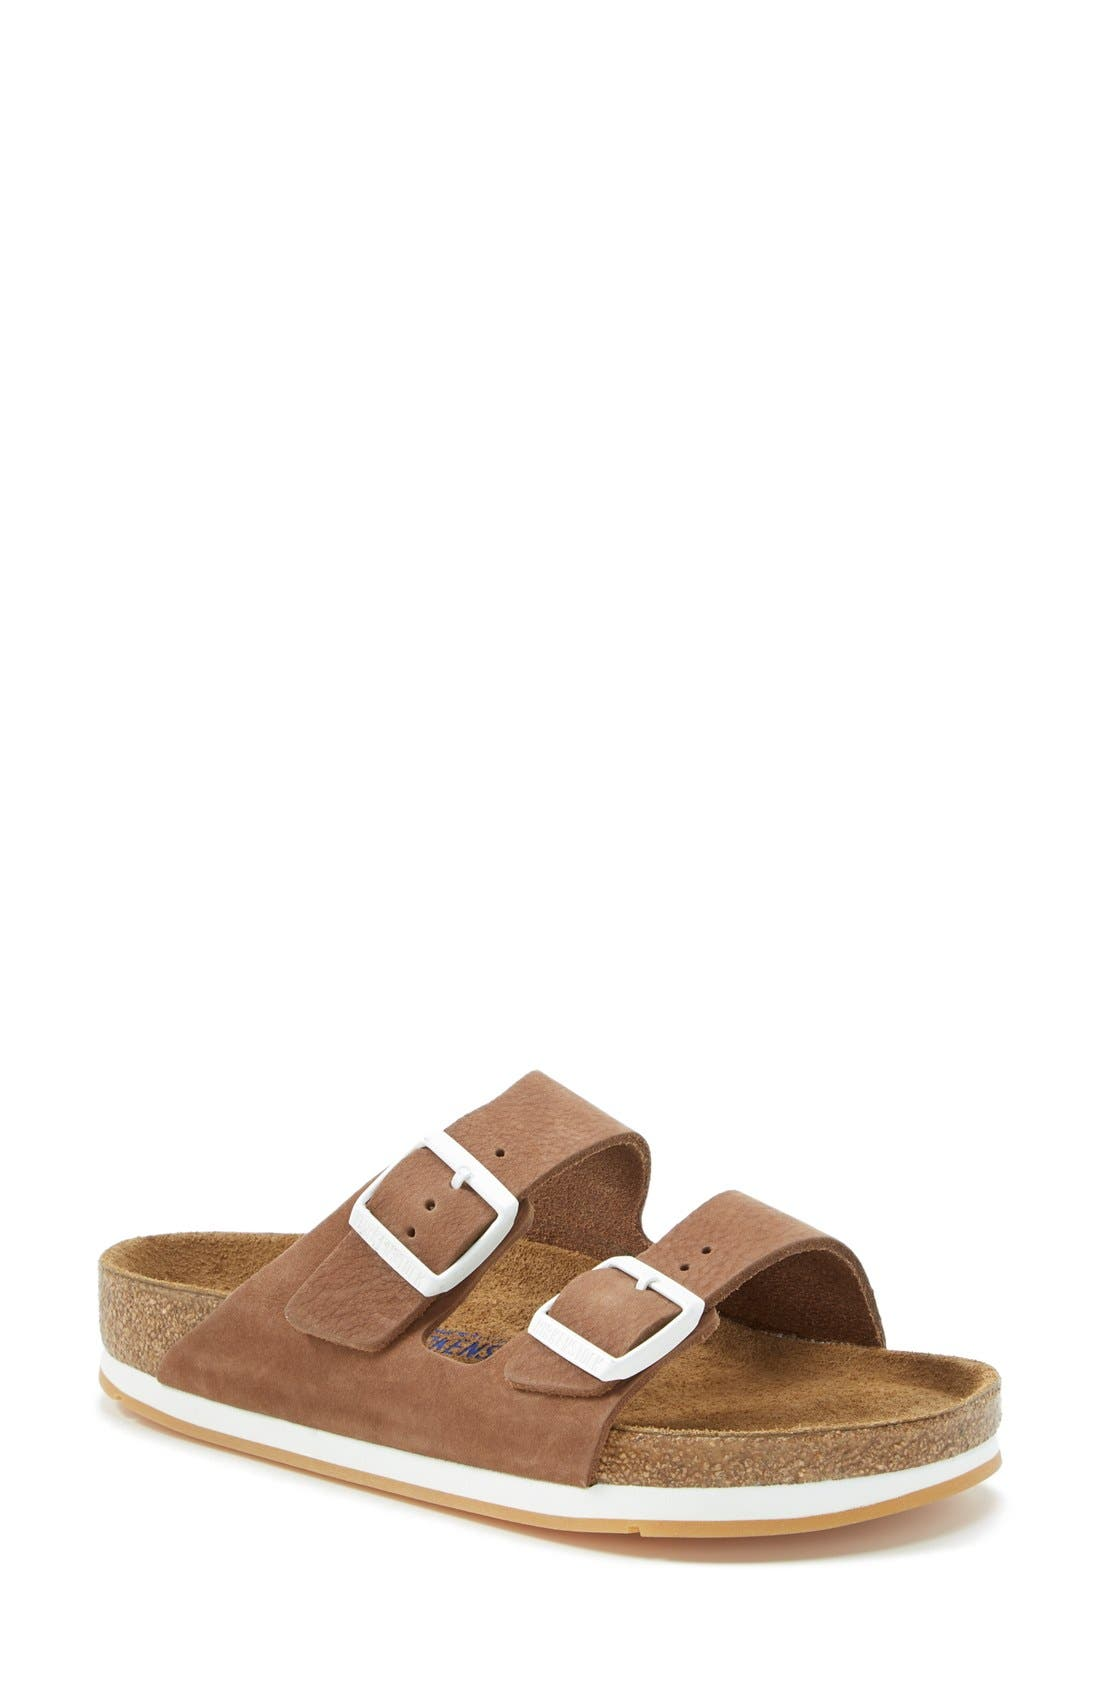 'Arizona' Soft Footbed Sandal,                         Main,                         color, 200